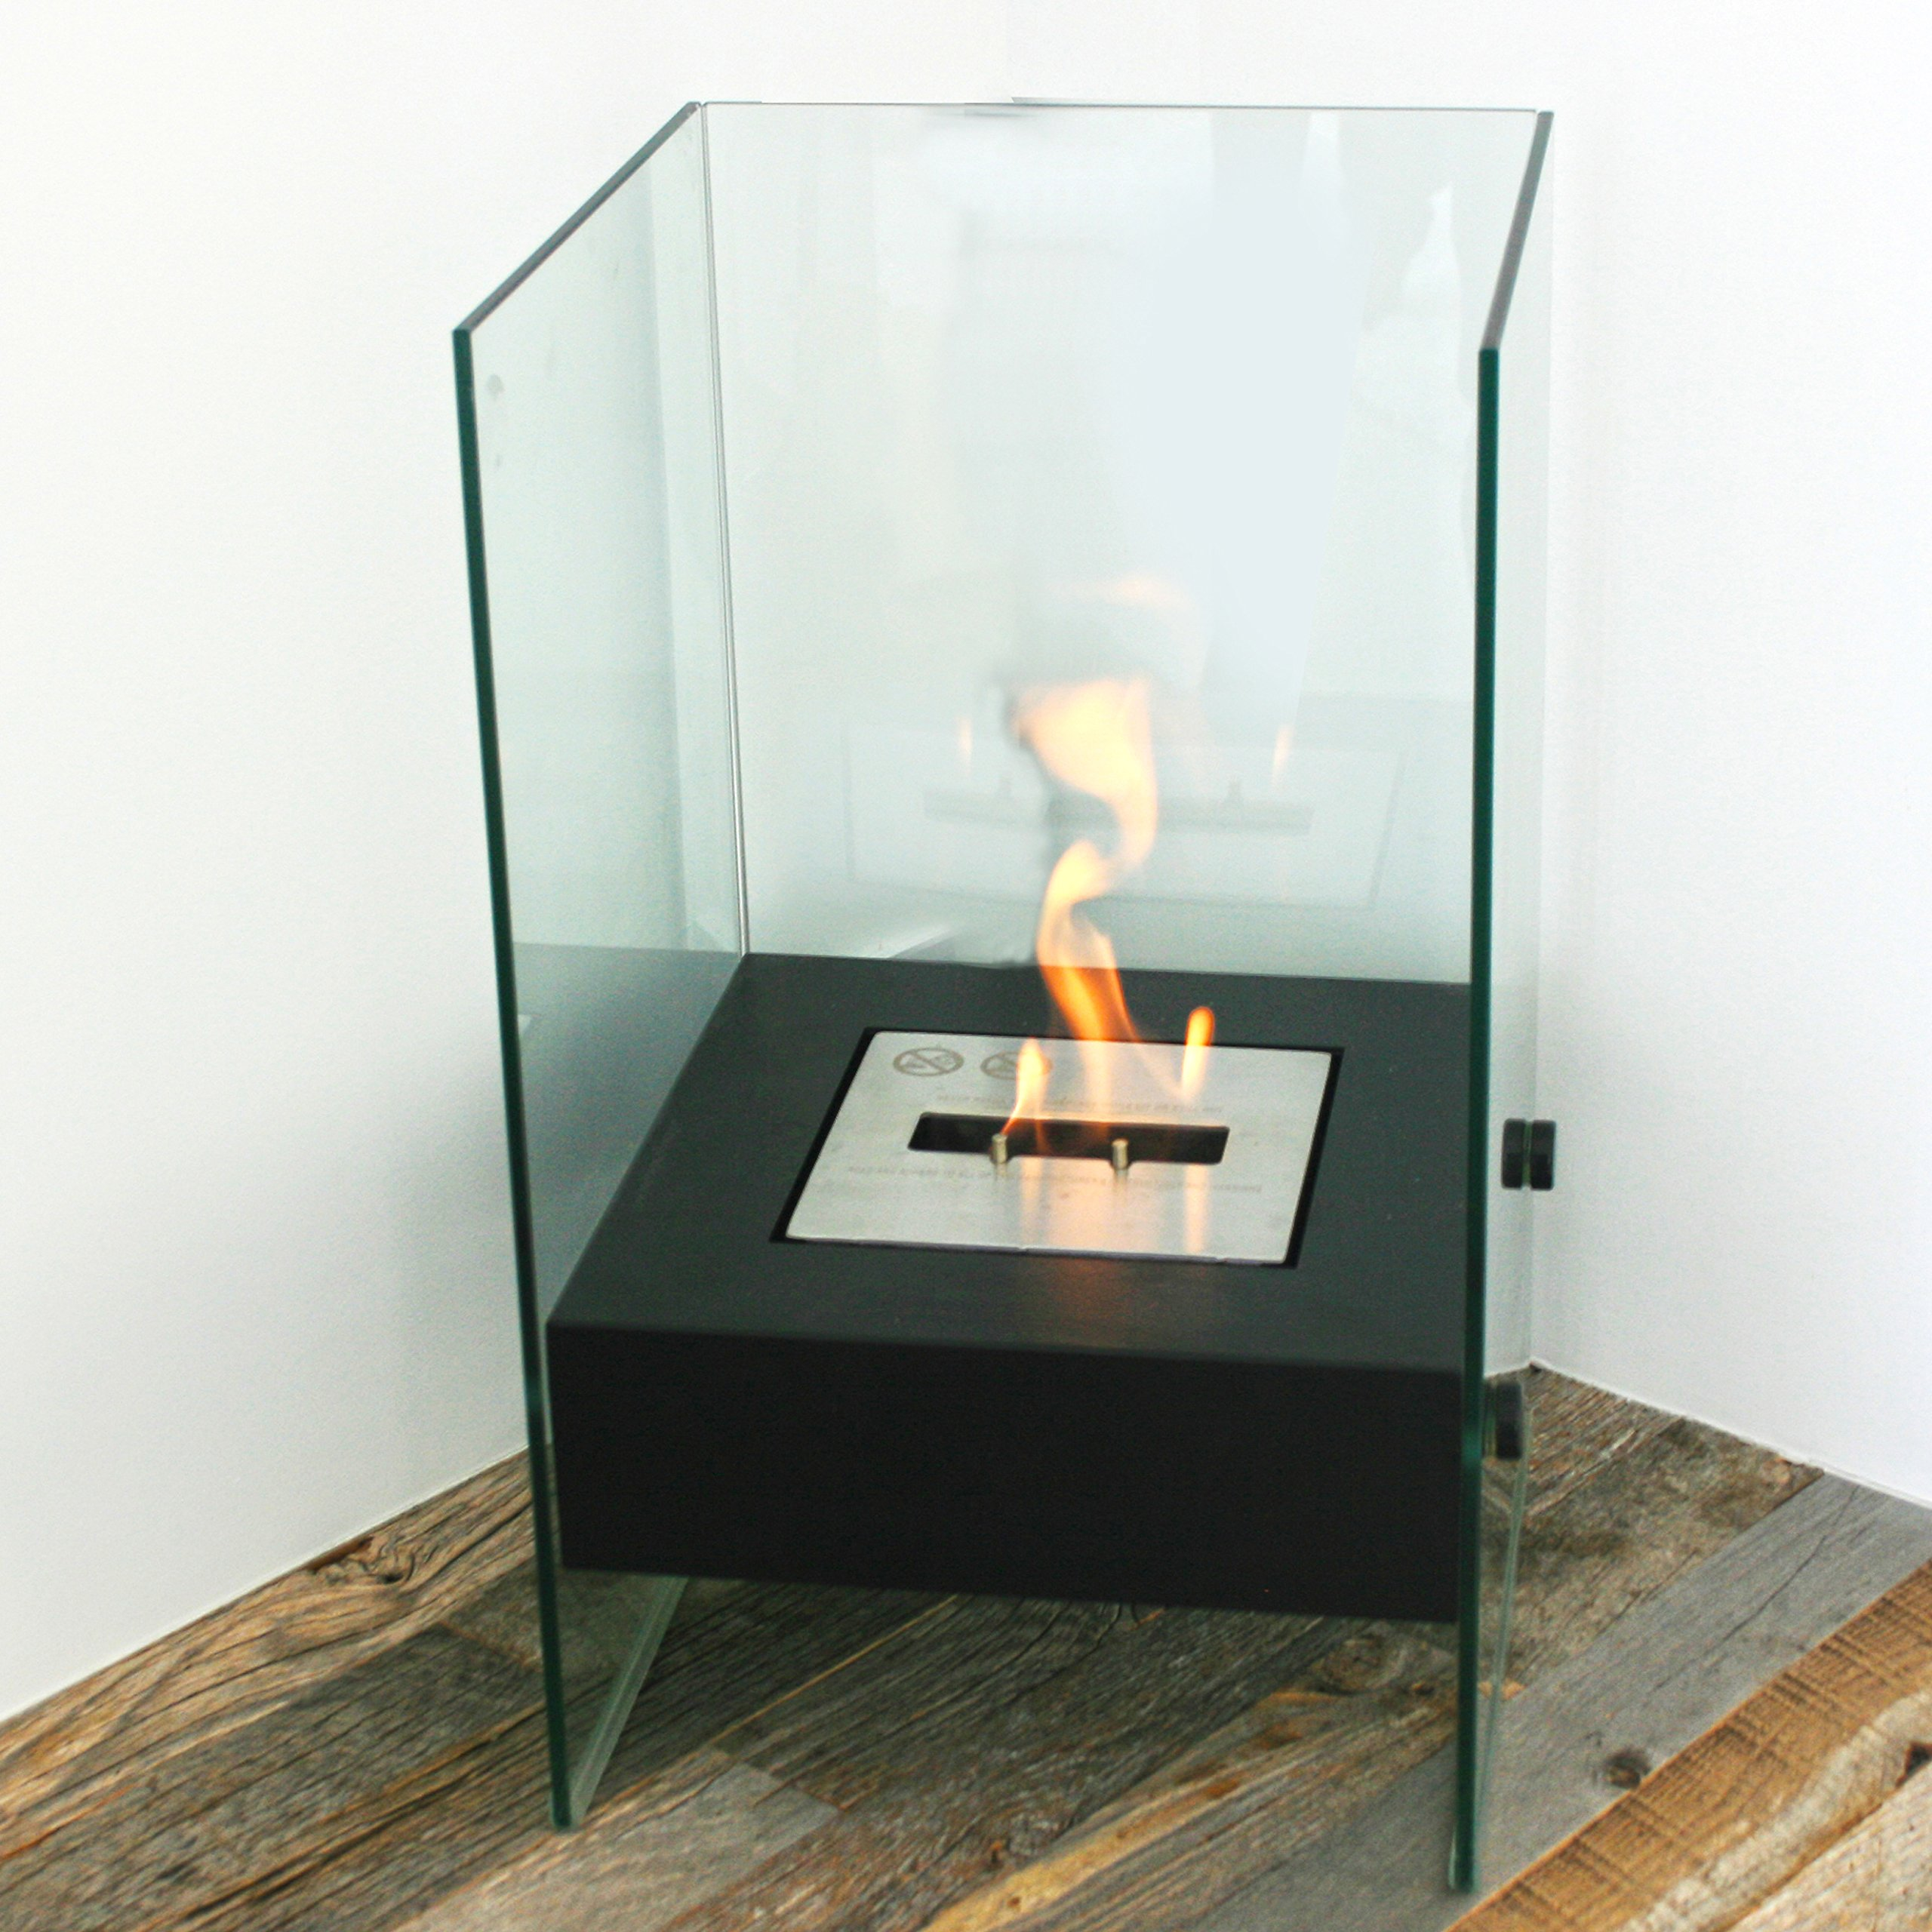 Chic Fireplaces Bismarck Luxury Ventless Black Free Standing Modern Bio-ethanol Fireplace Stainless Steel Burner Insert